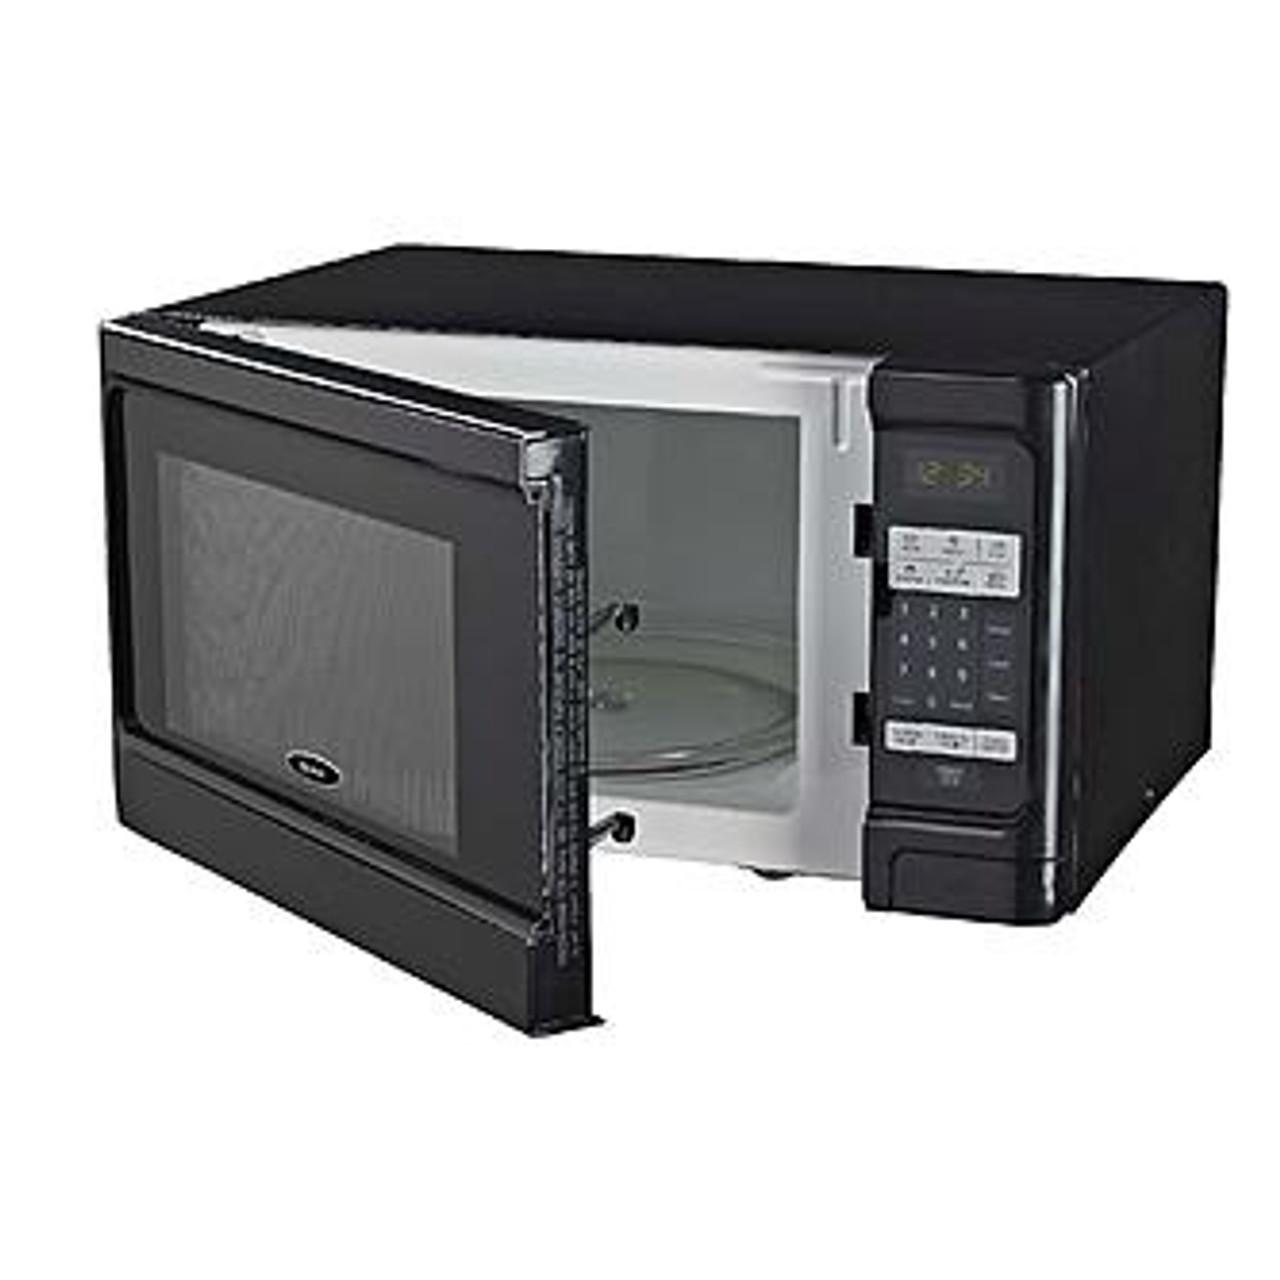 microwave oster 1 1 cf ogs31102 black